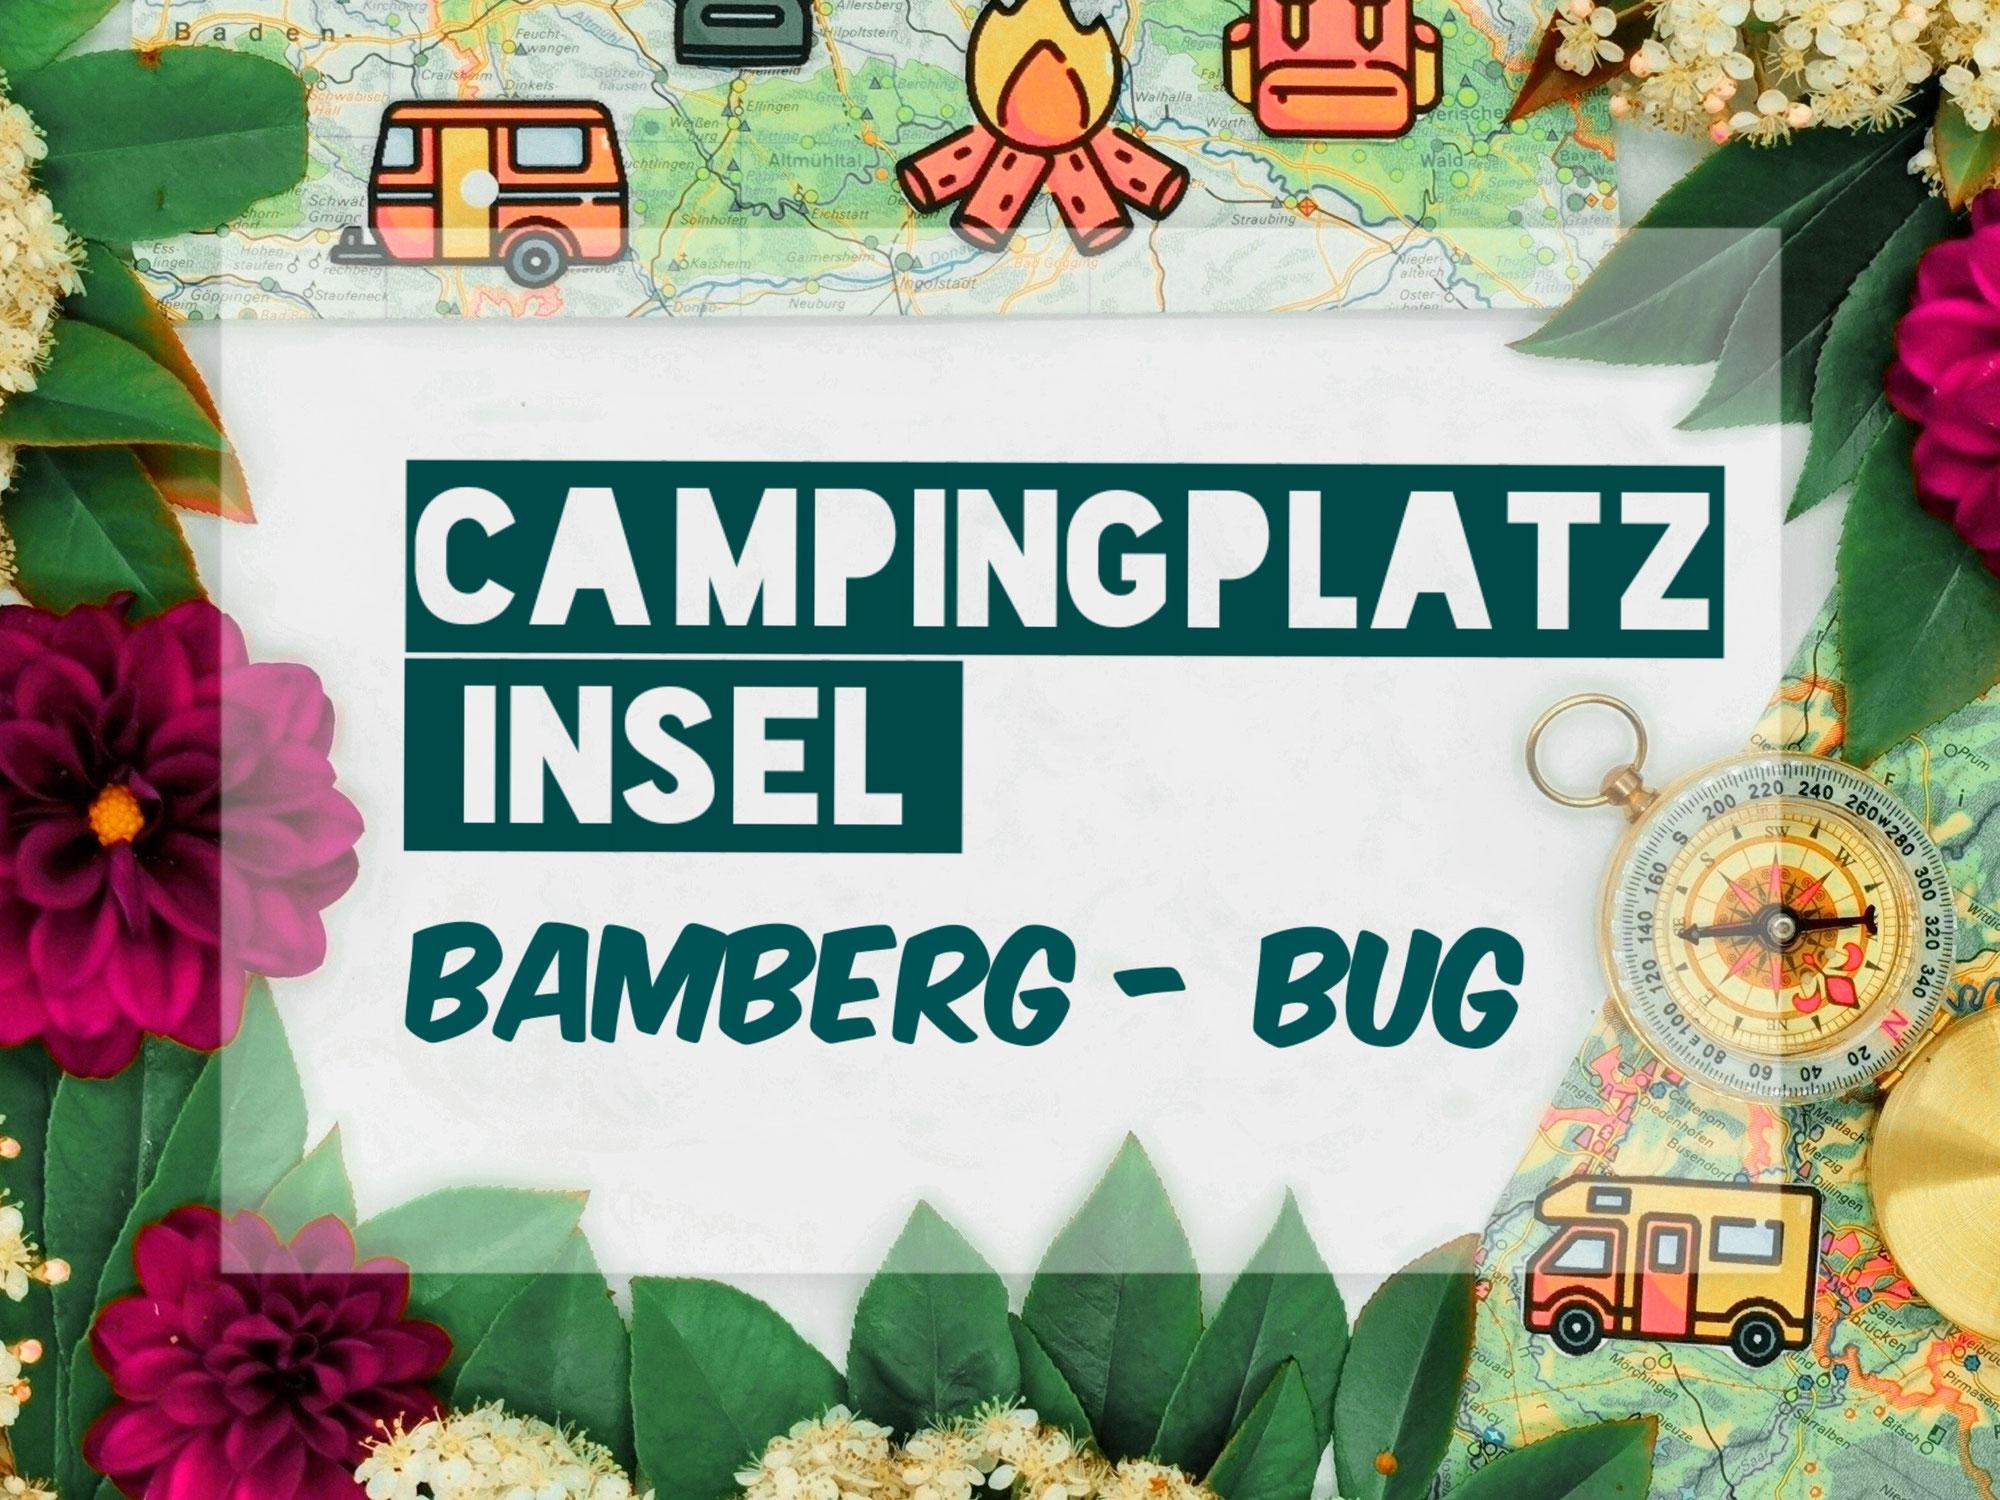 Campingplatz Insel | Bamberg-Bug